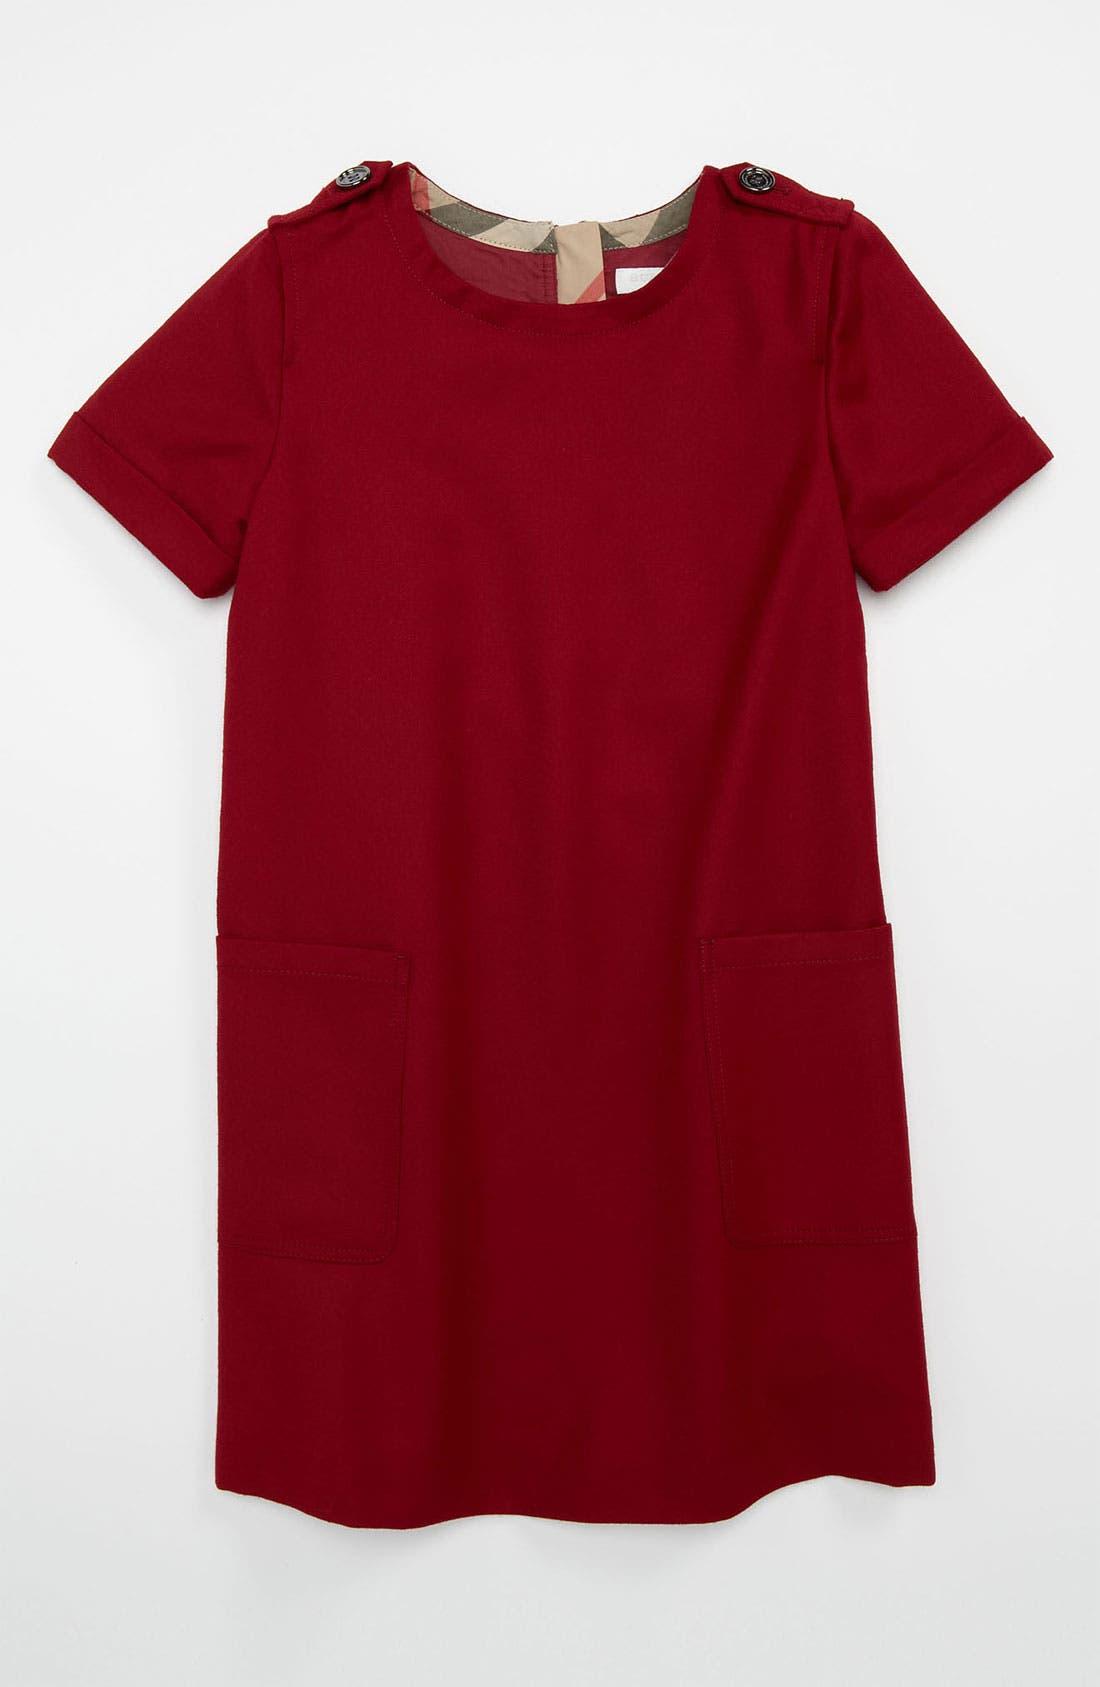 Alternate Image 1 Selected - Burberry Shift Dress (Little Girls & Big Girls)